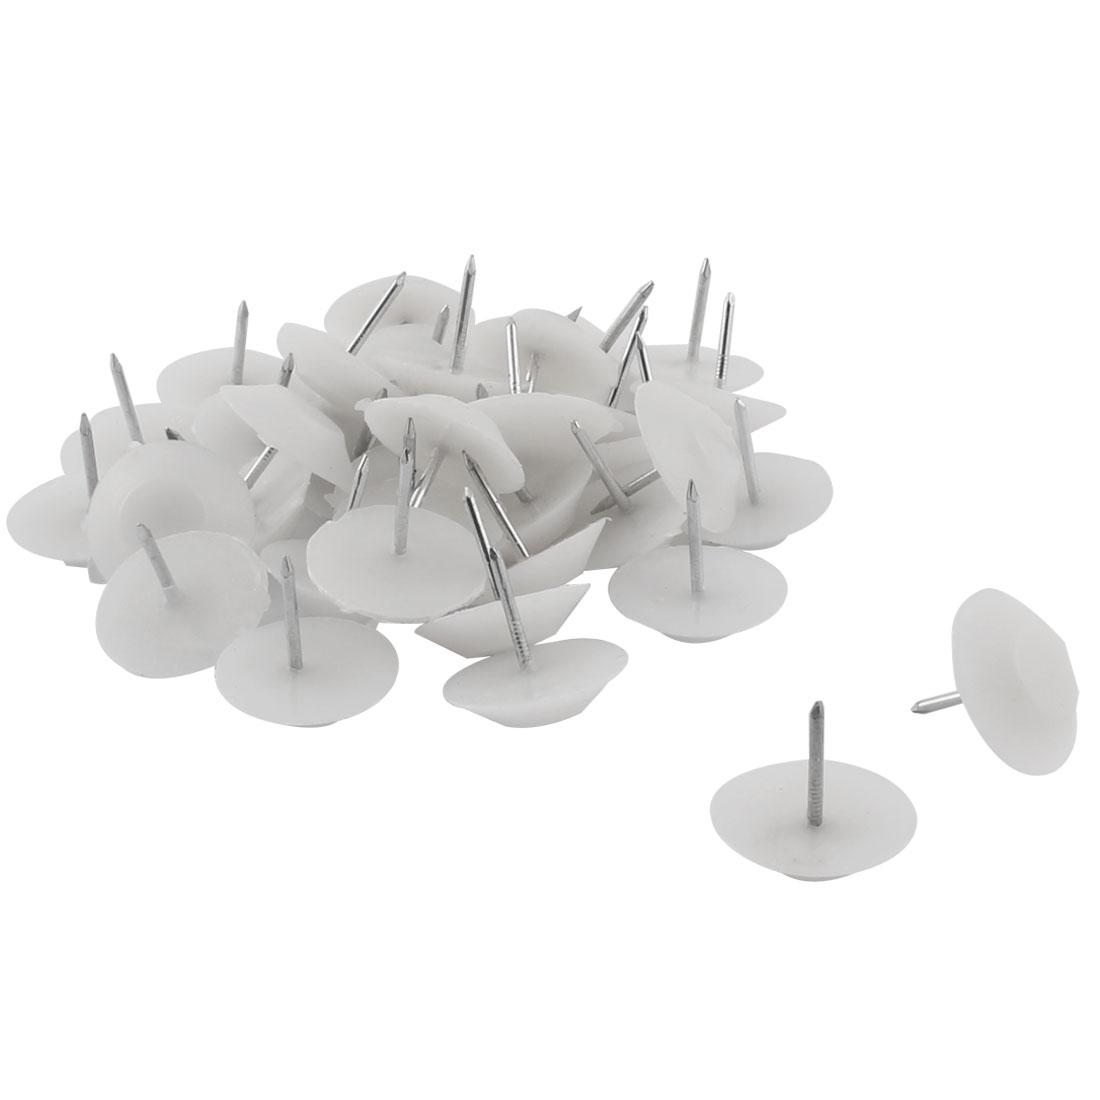 Furniture Feet Anti-slide Floor Protector Pad Nails 20mm Head Dia 30 Pcs